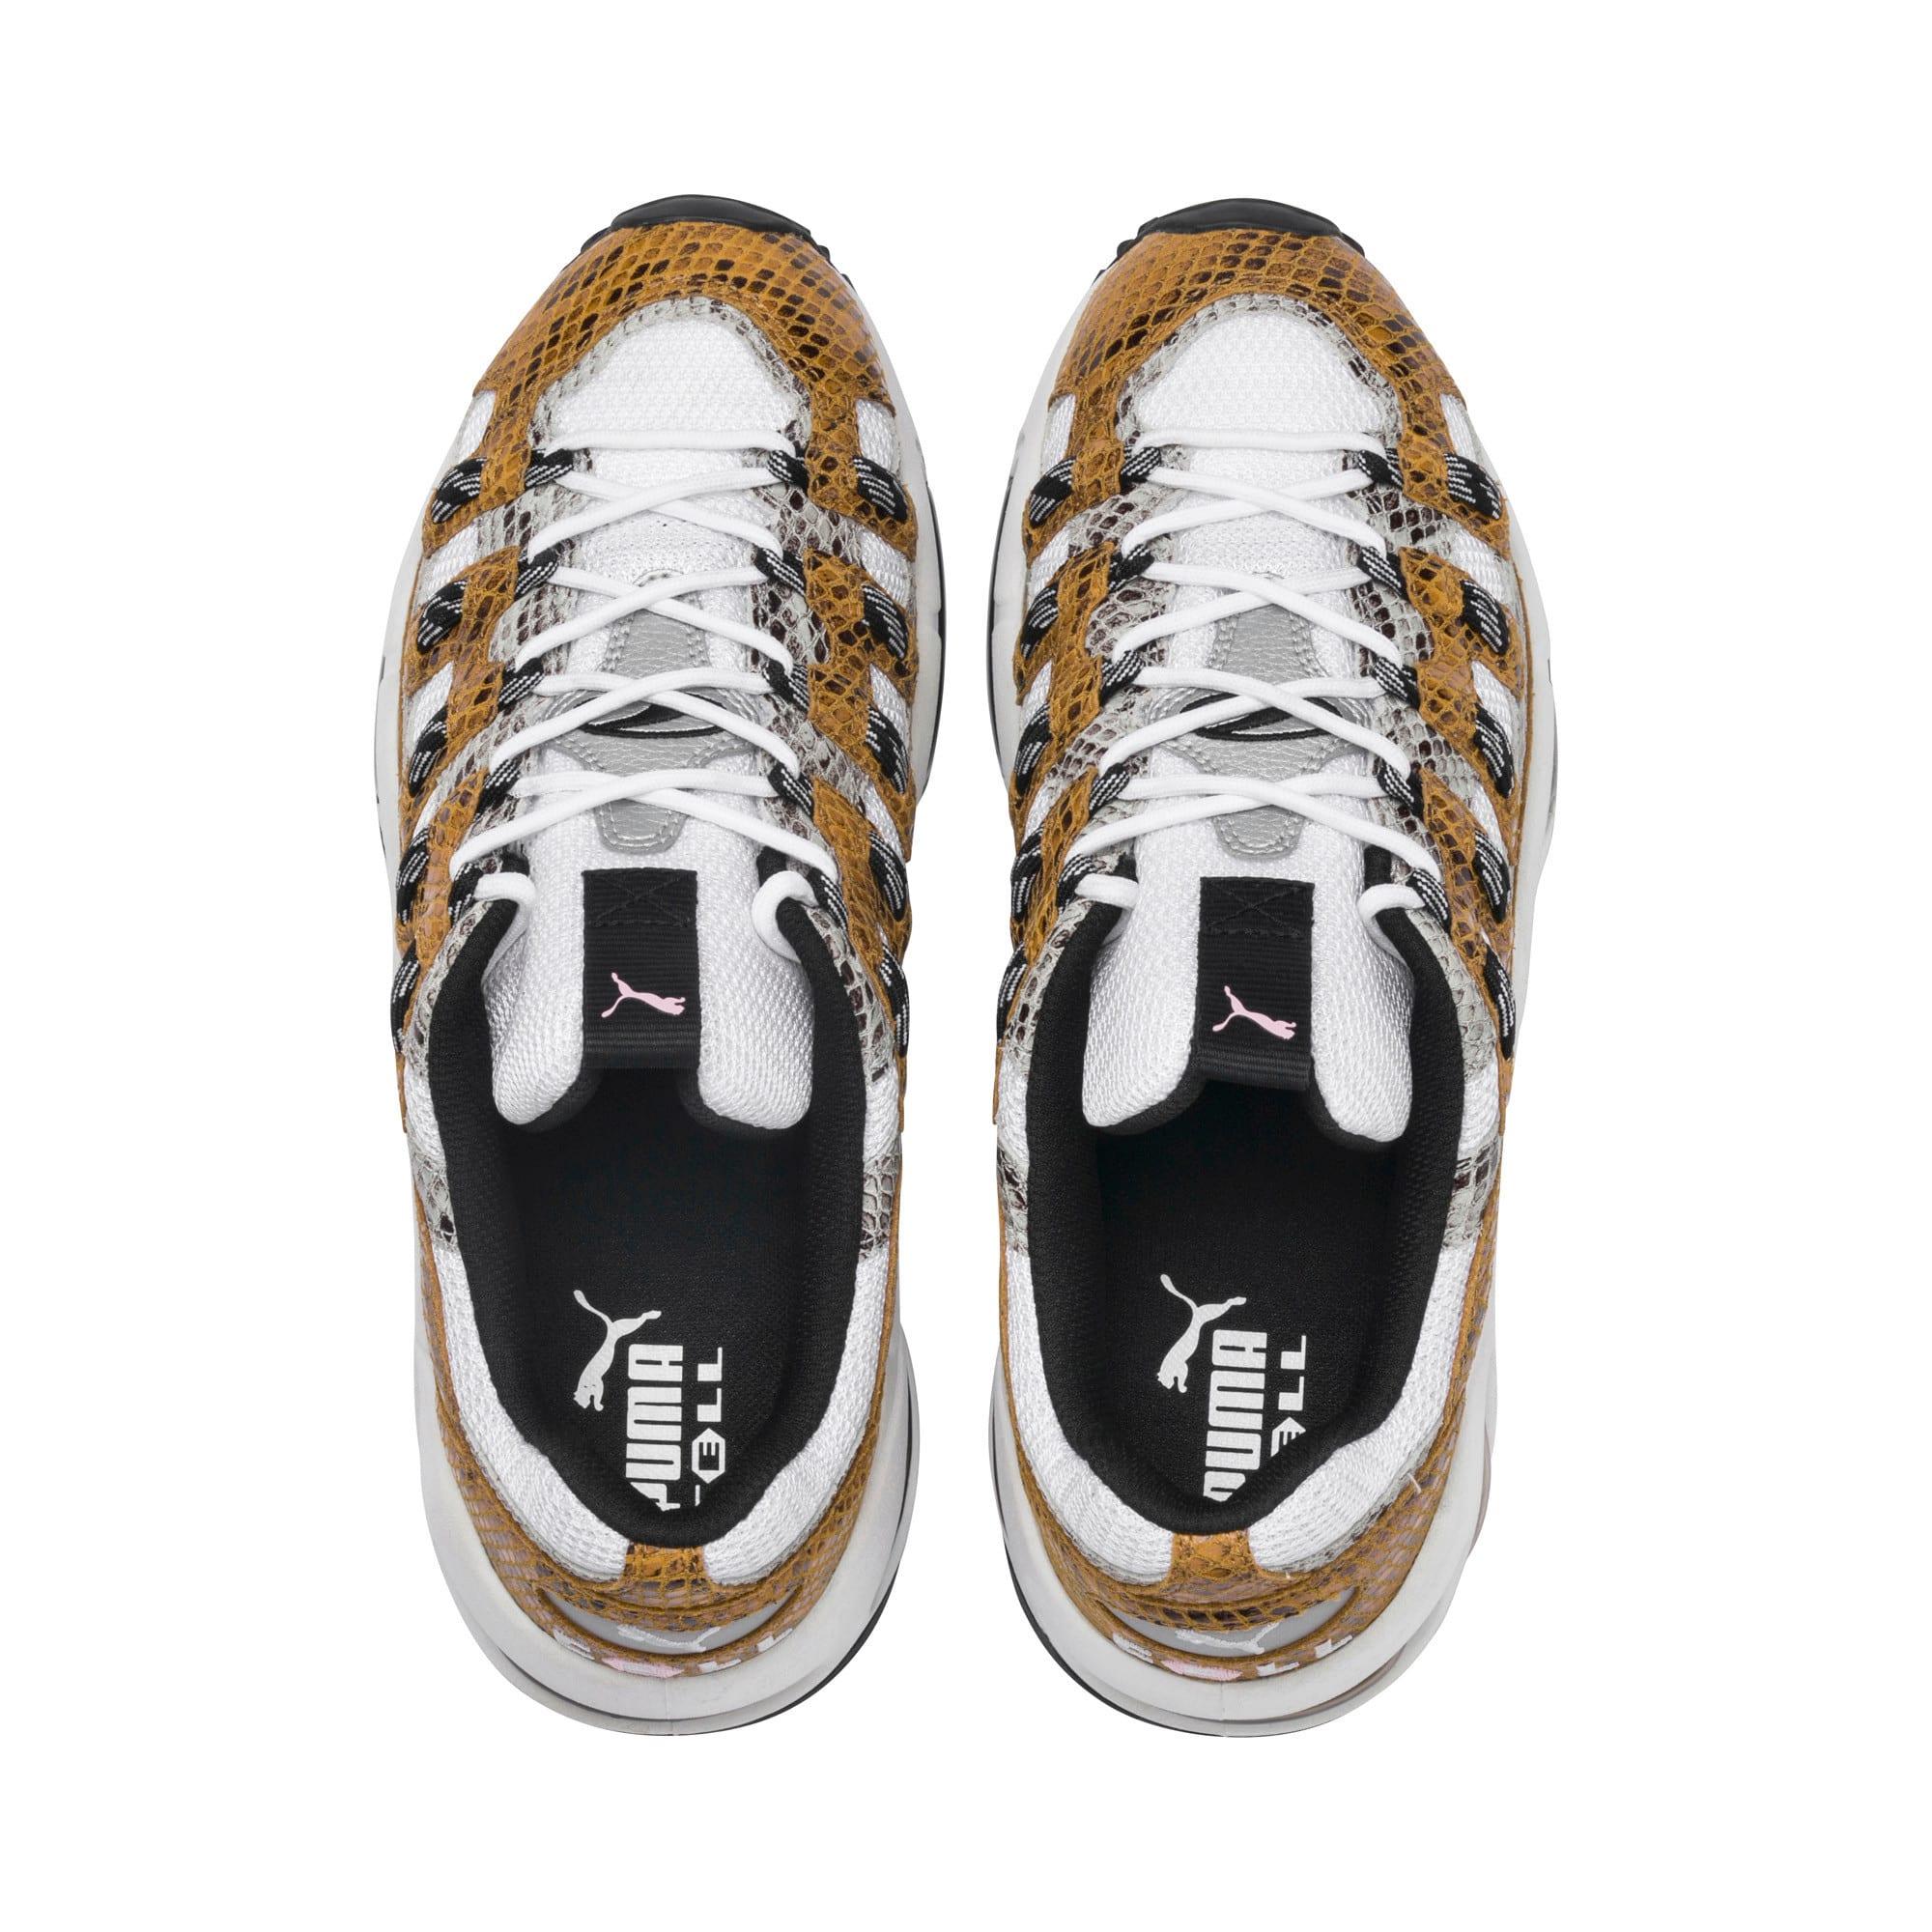 Thumbnail 7 of CELL Endura Animal Kingdom Sneakers, Puma White-Golden Orange, medium